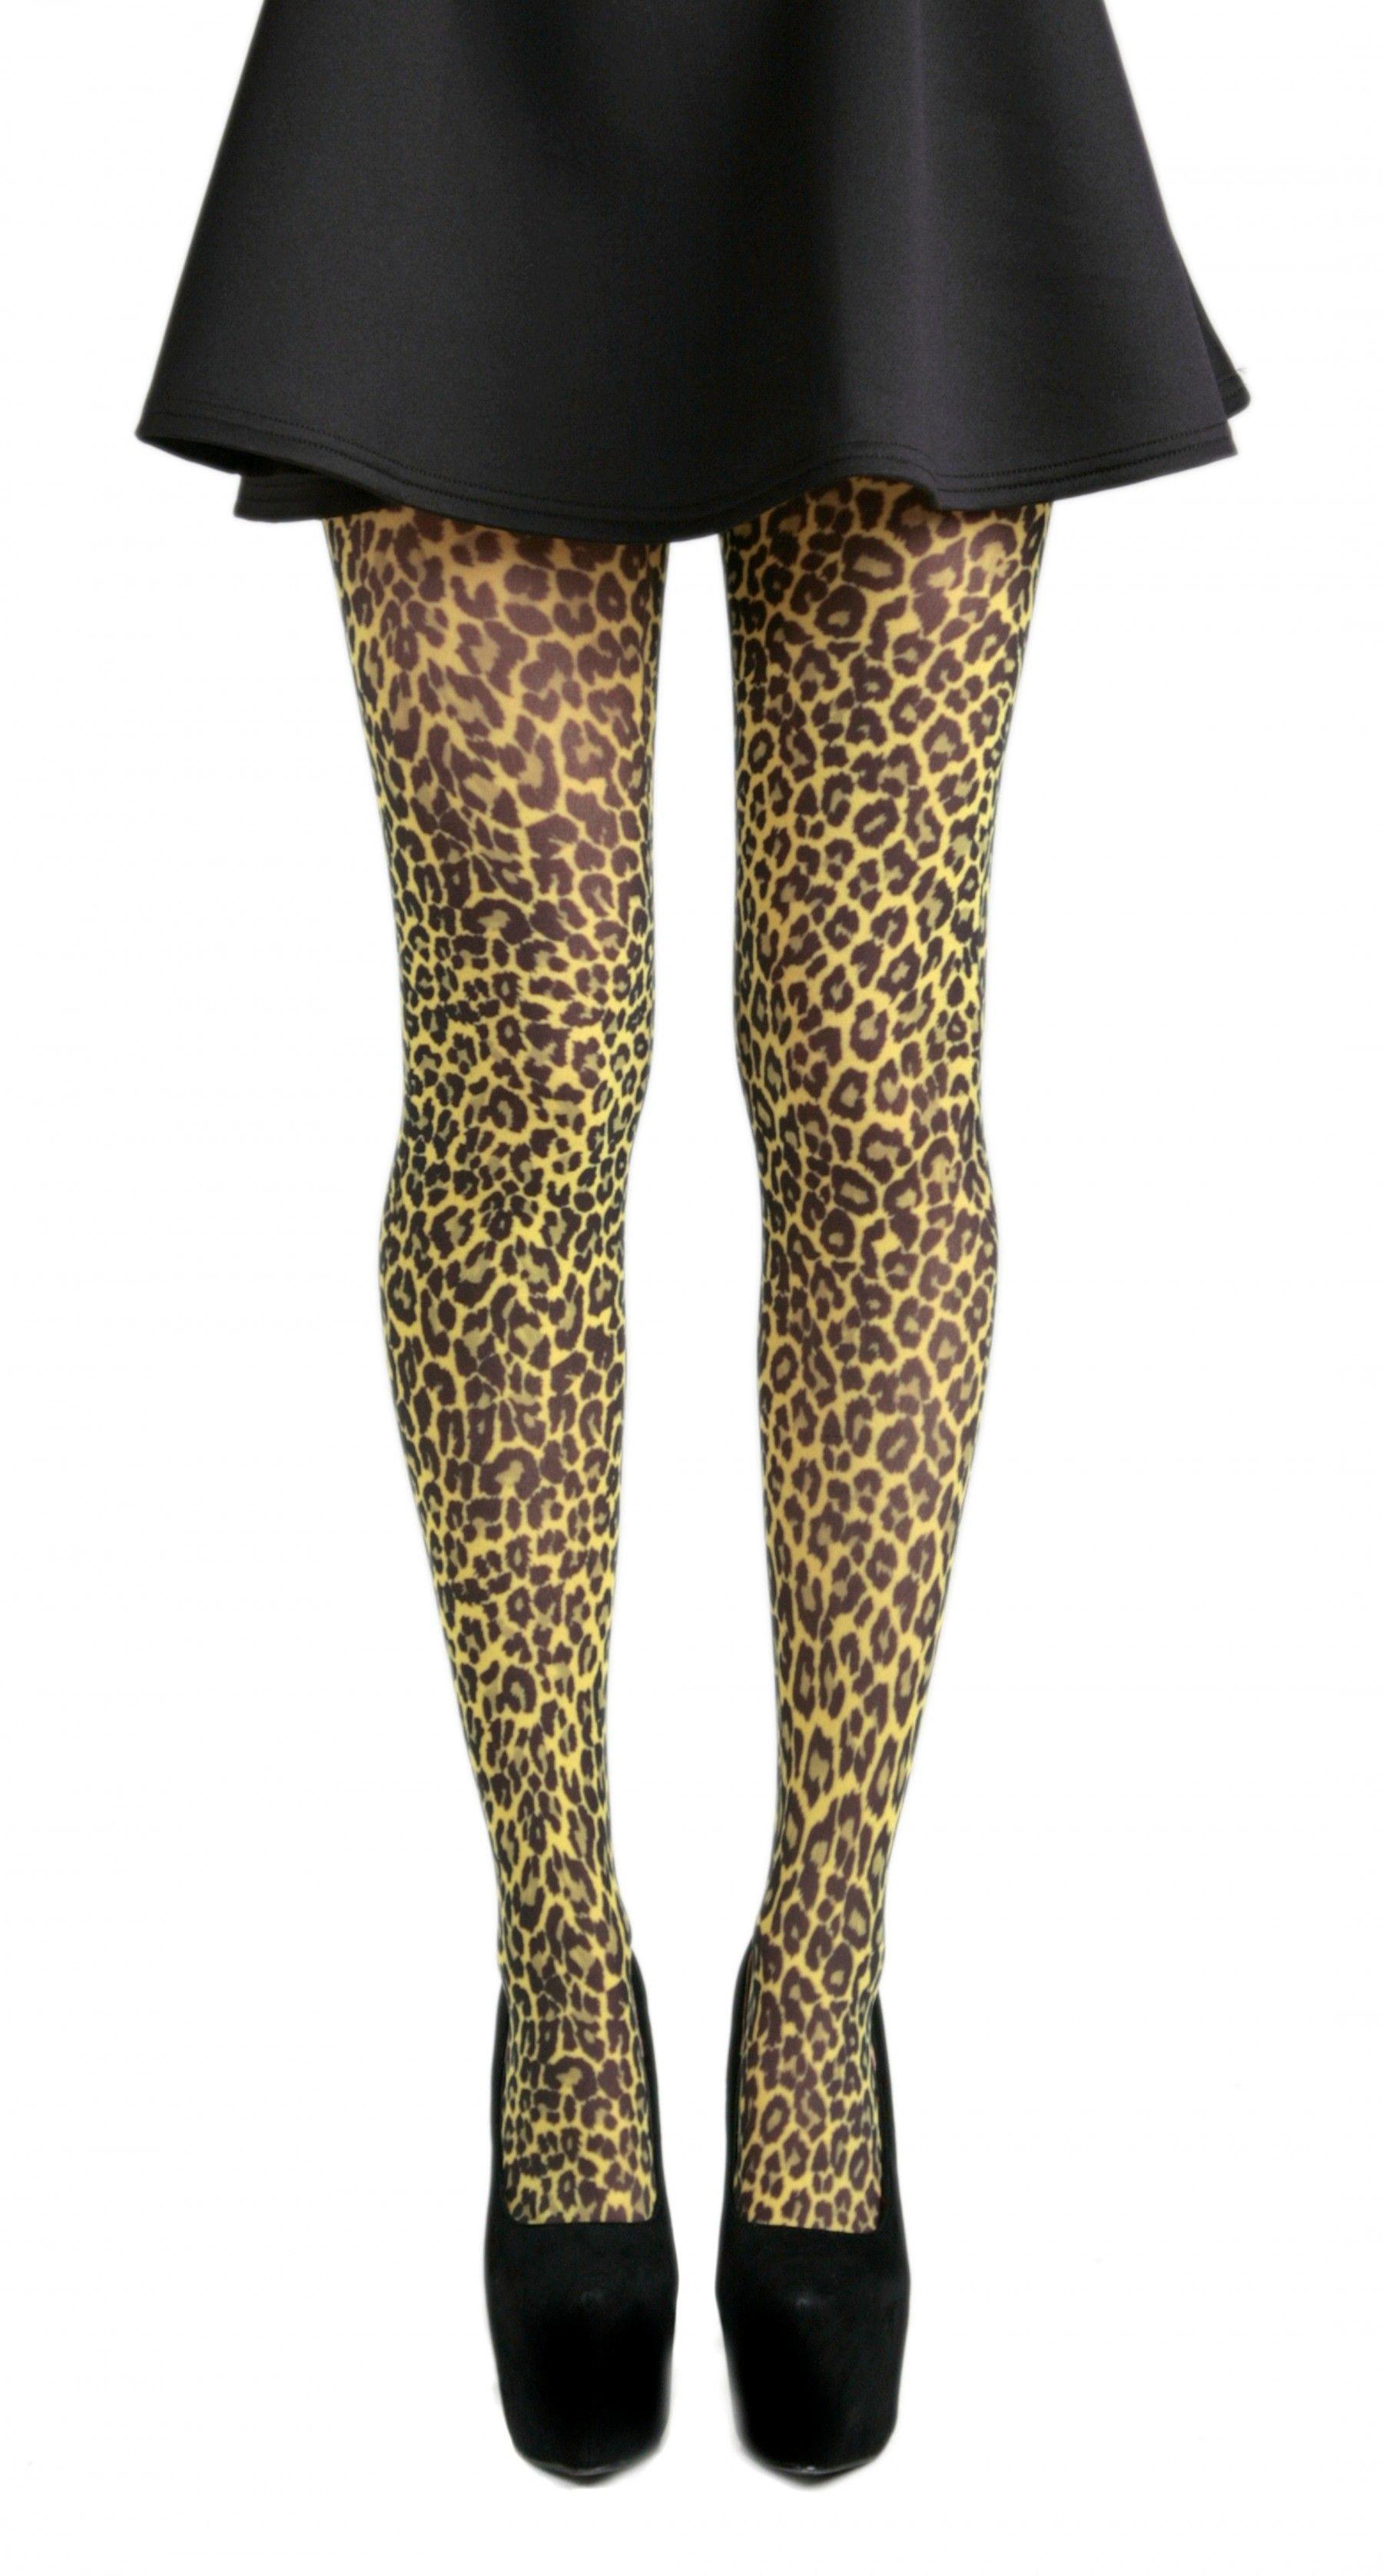 356ec04e2c079 Small Leopard Printed Tights (Flo Yellow)   Tights   Tights, Fashion ...